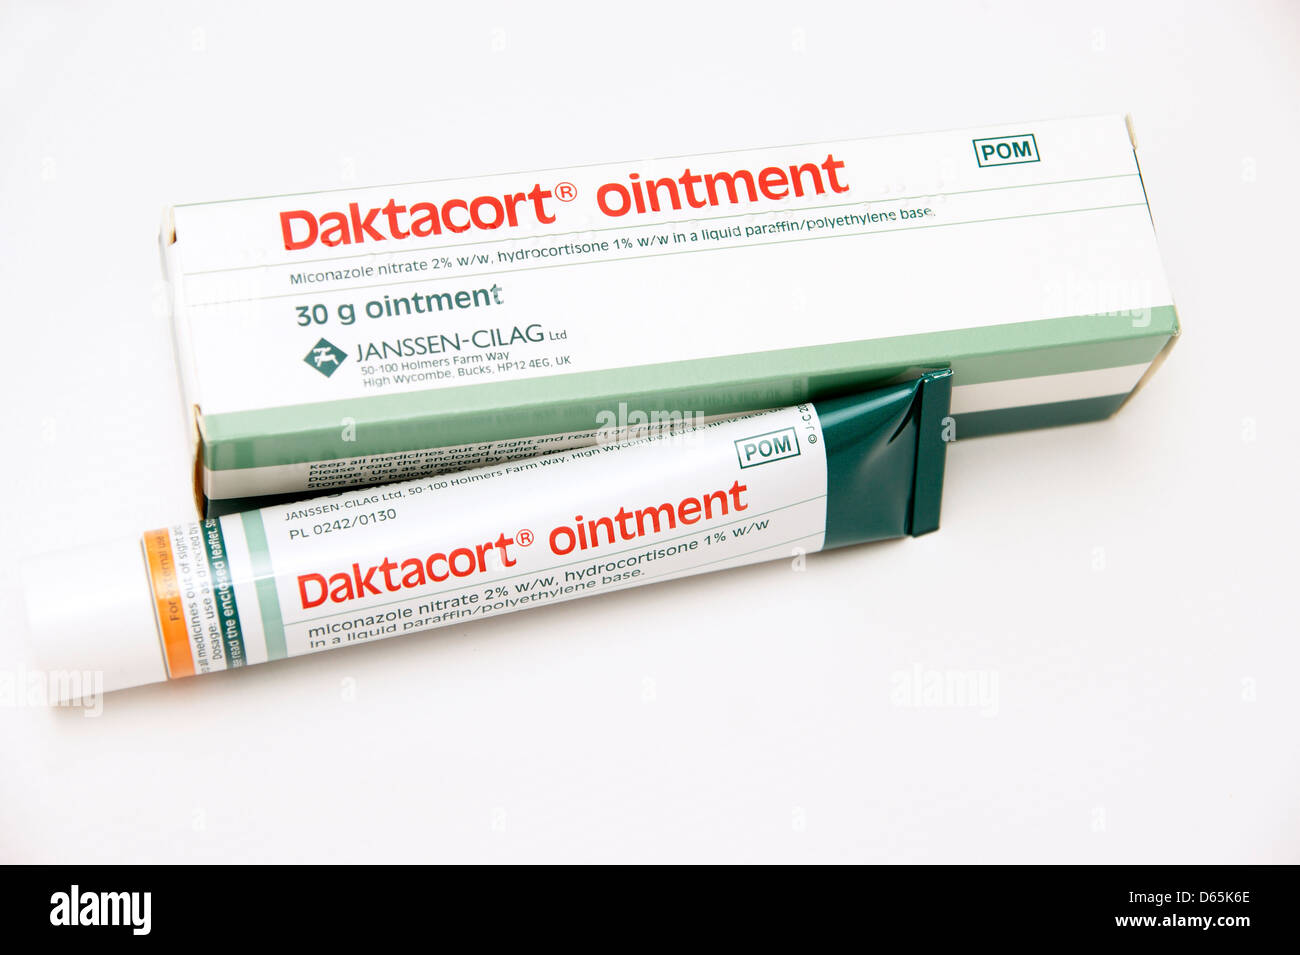 steroid cream treatment for eczema